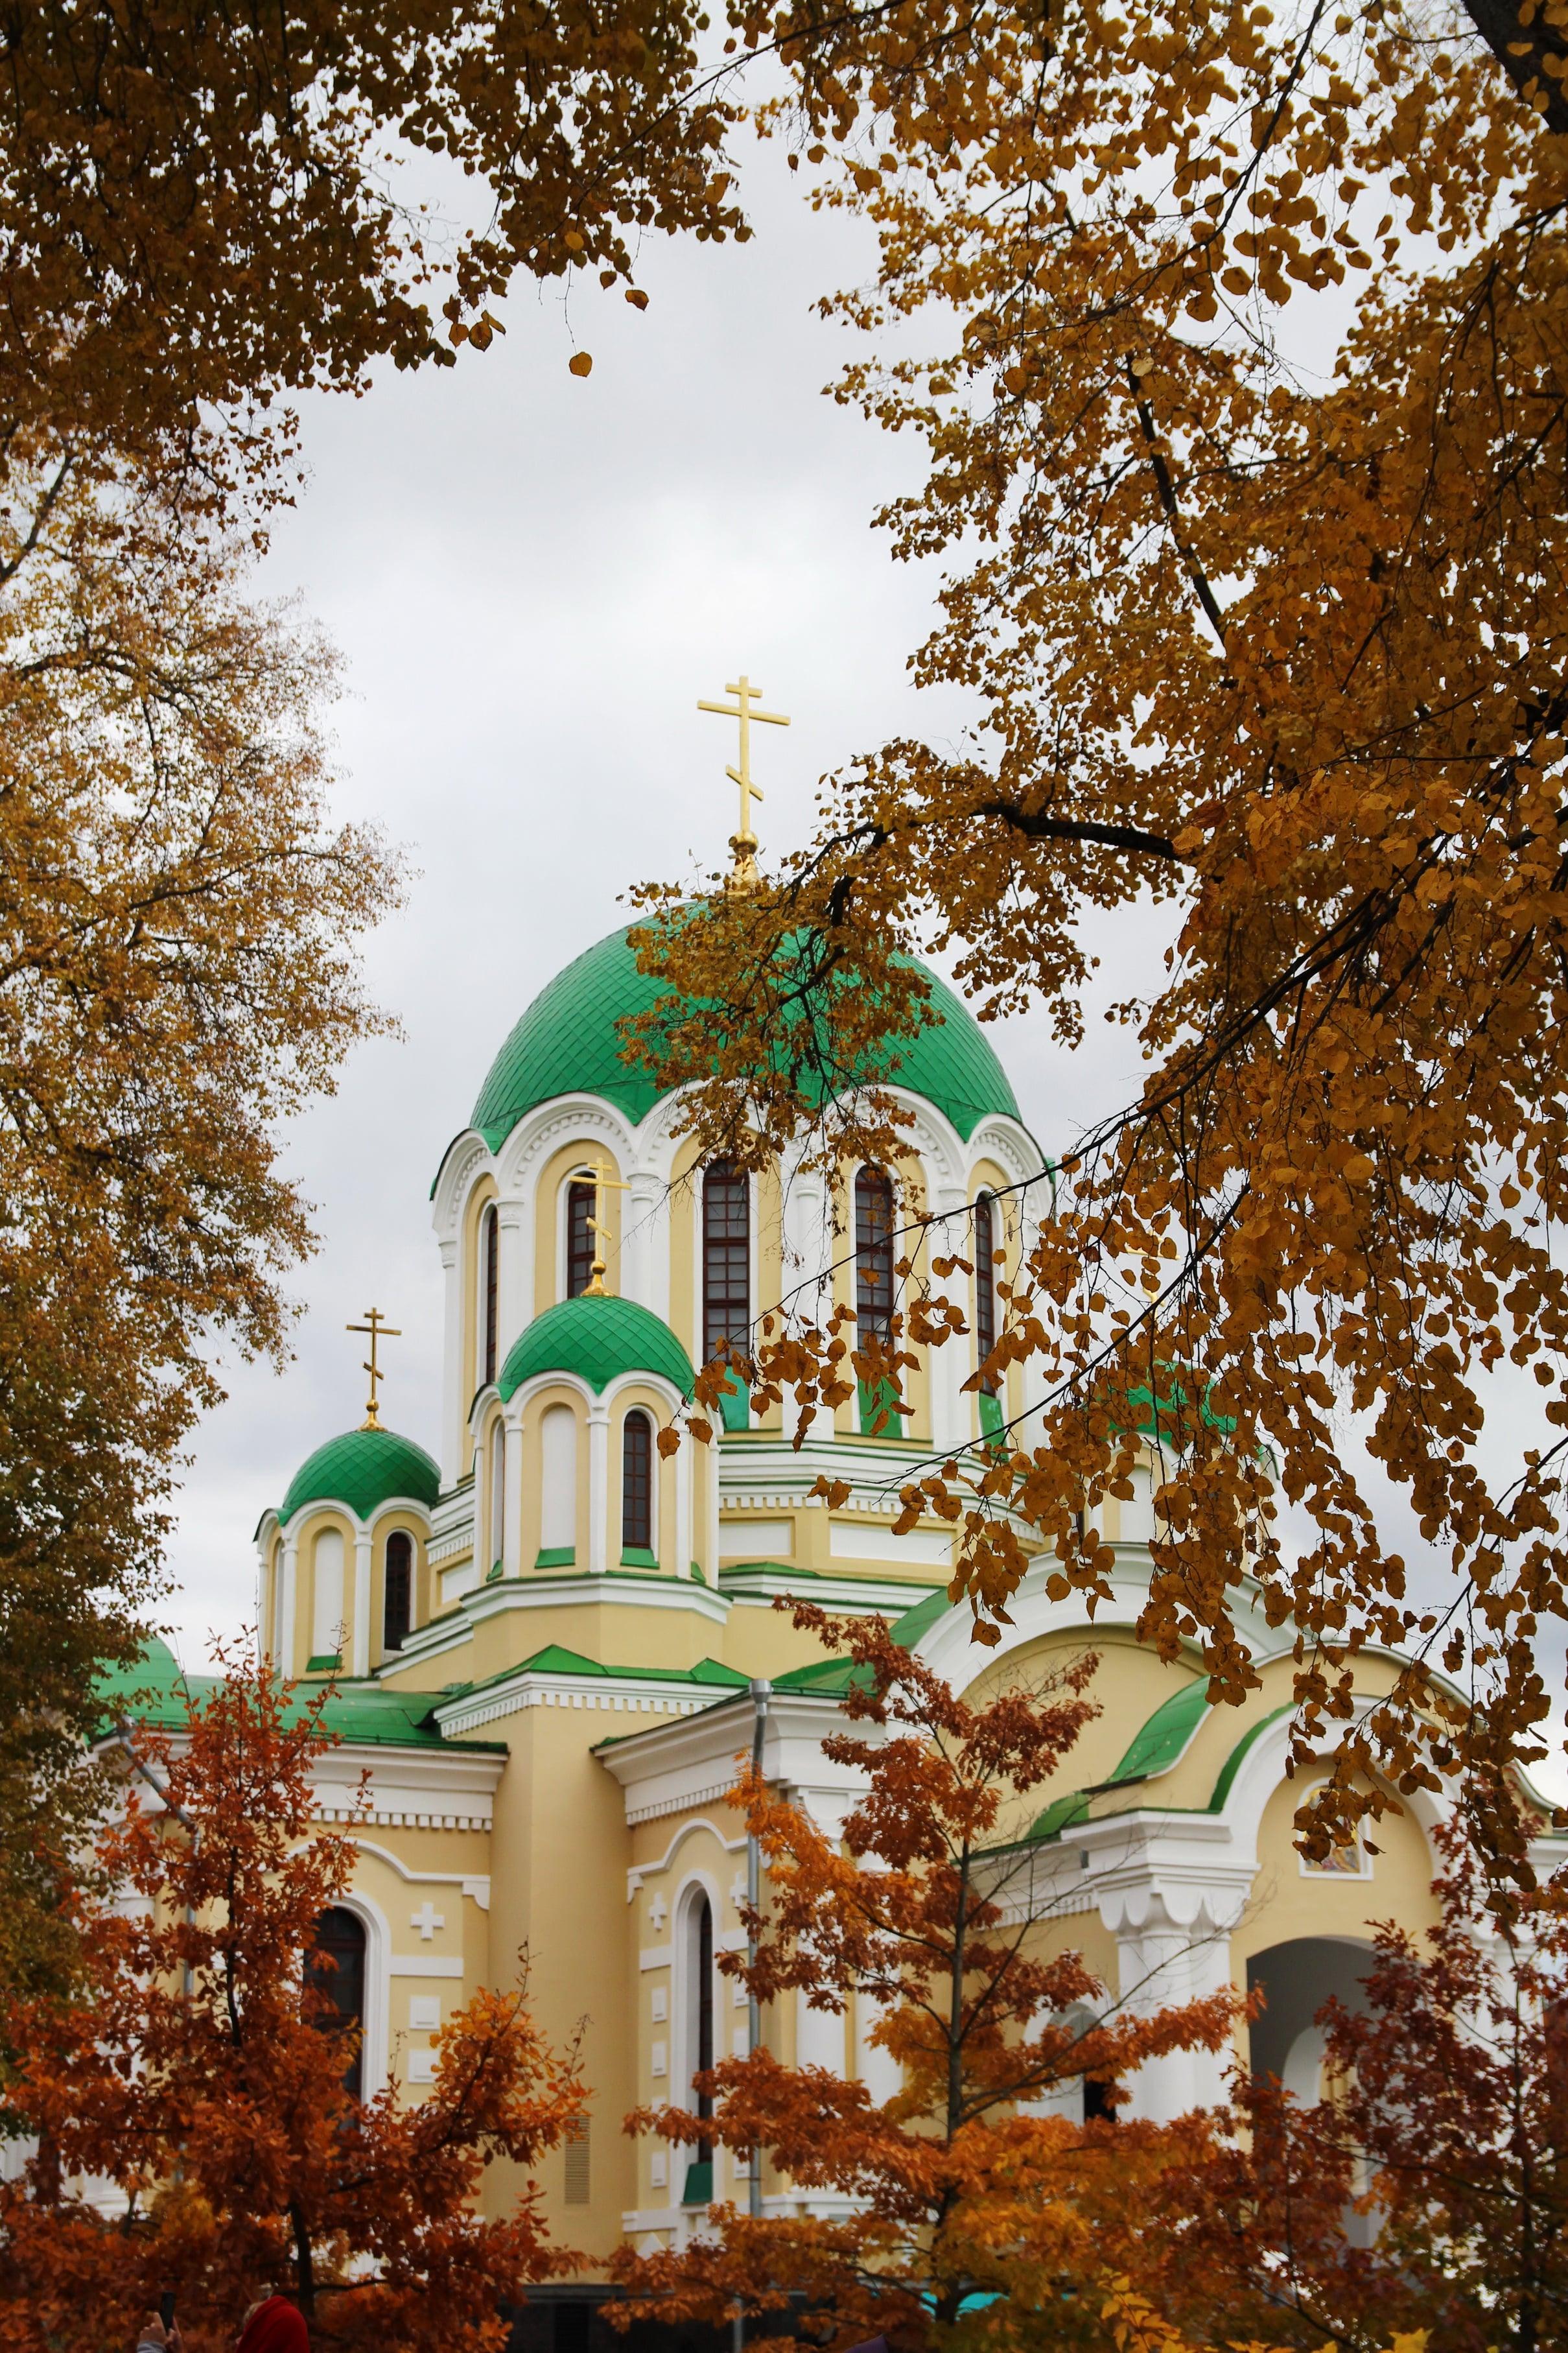 http://monuspen.ru/photoreports/7df66090564ac3621568a9866ab706aq.JPG